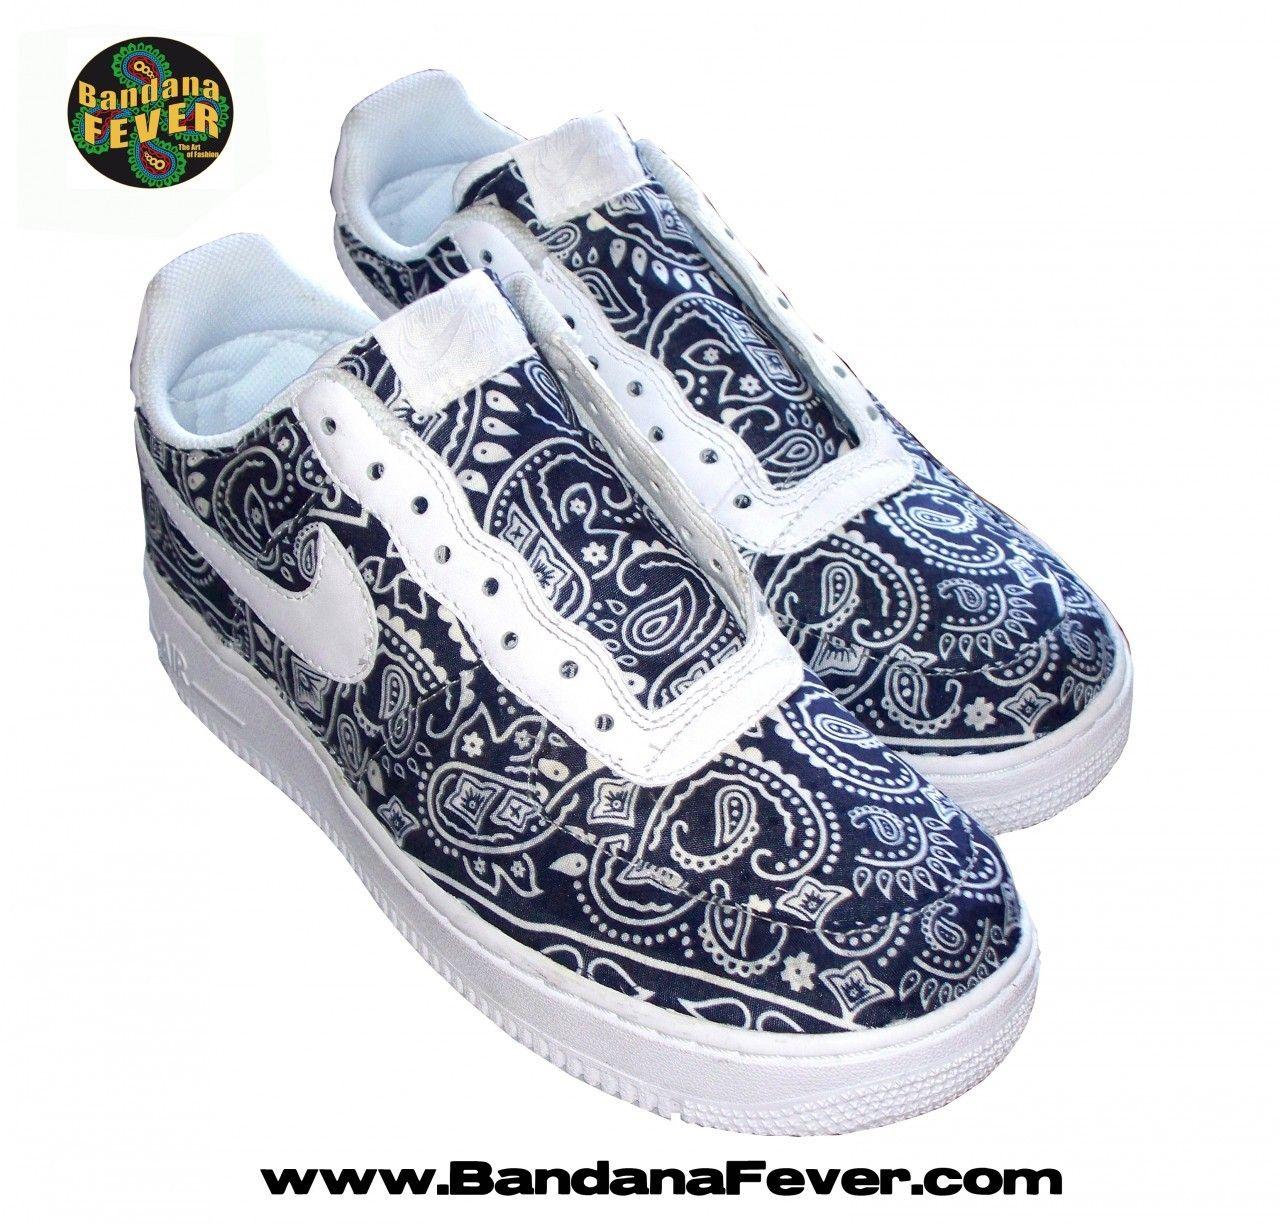 buy popular 8a283 9a656 australia customized houston texans nike sneakers mens white bandana fever  4404b 71206  coupon for nike air force 1 low custom a57a4 f13e1